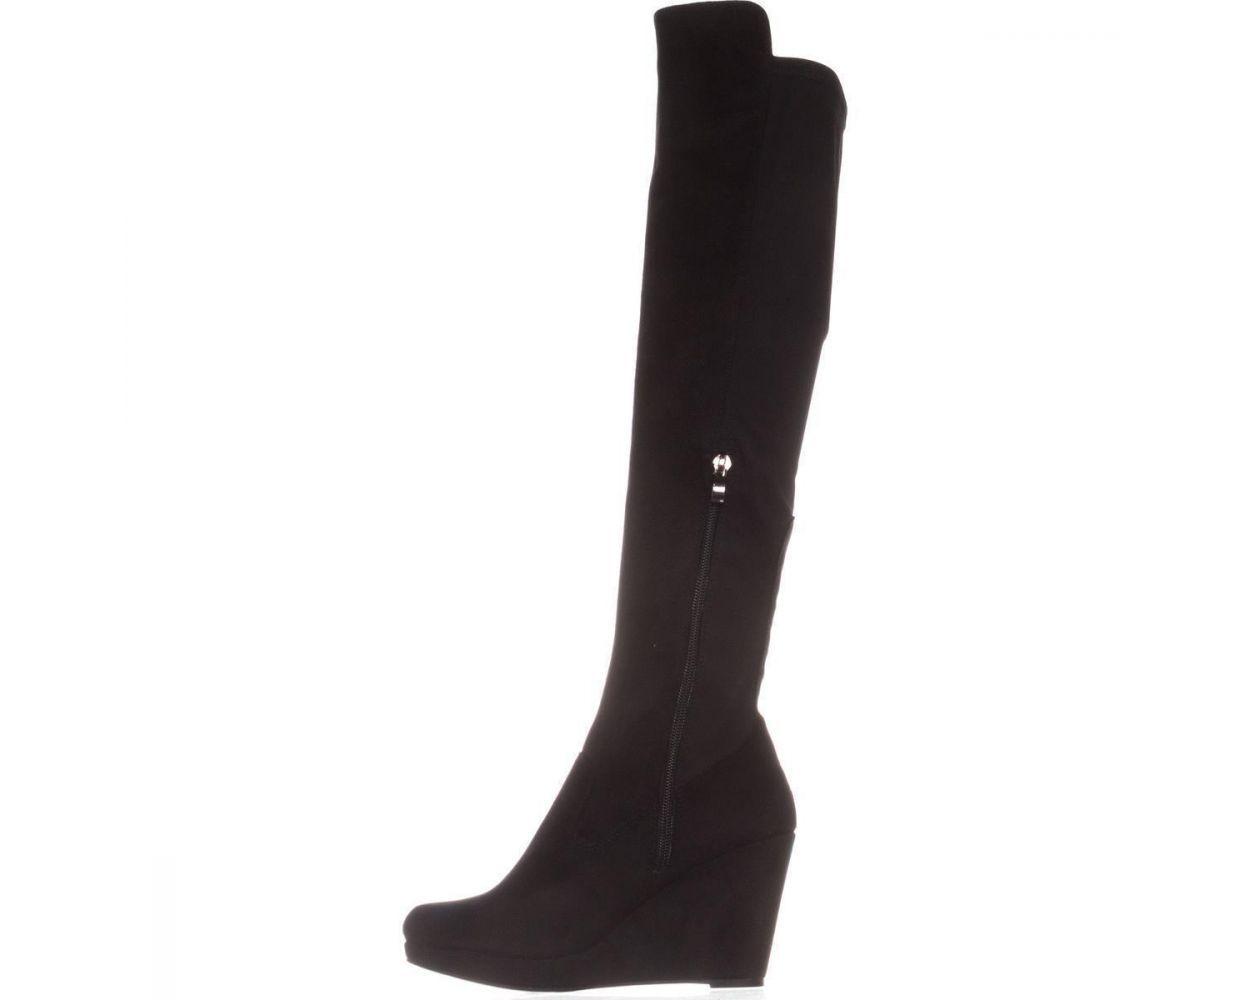 Chinese Laundry Lavish Knee High Wedge Boots Black Wedge Boots